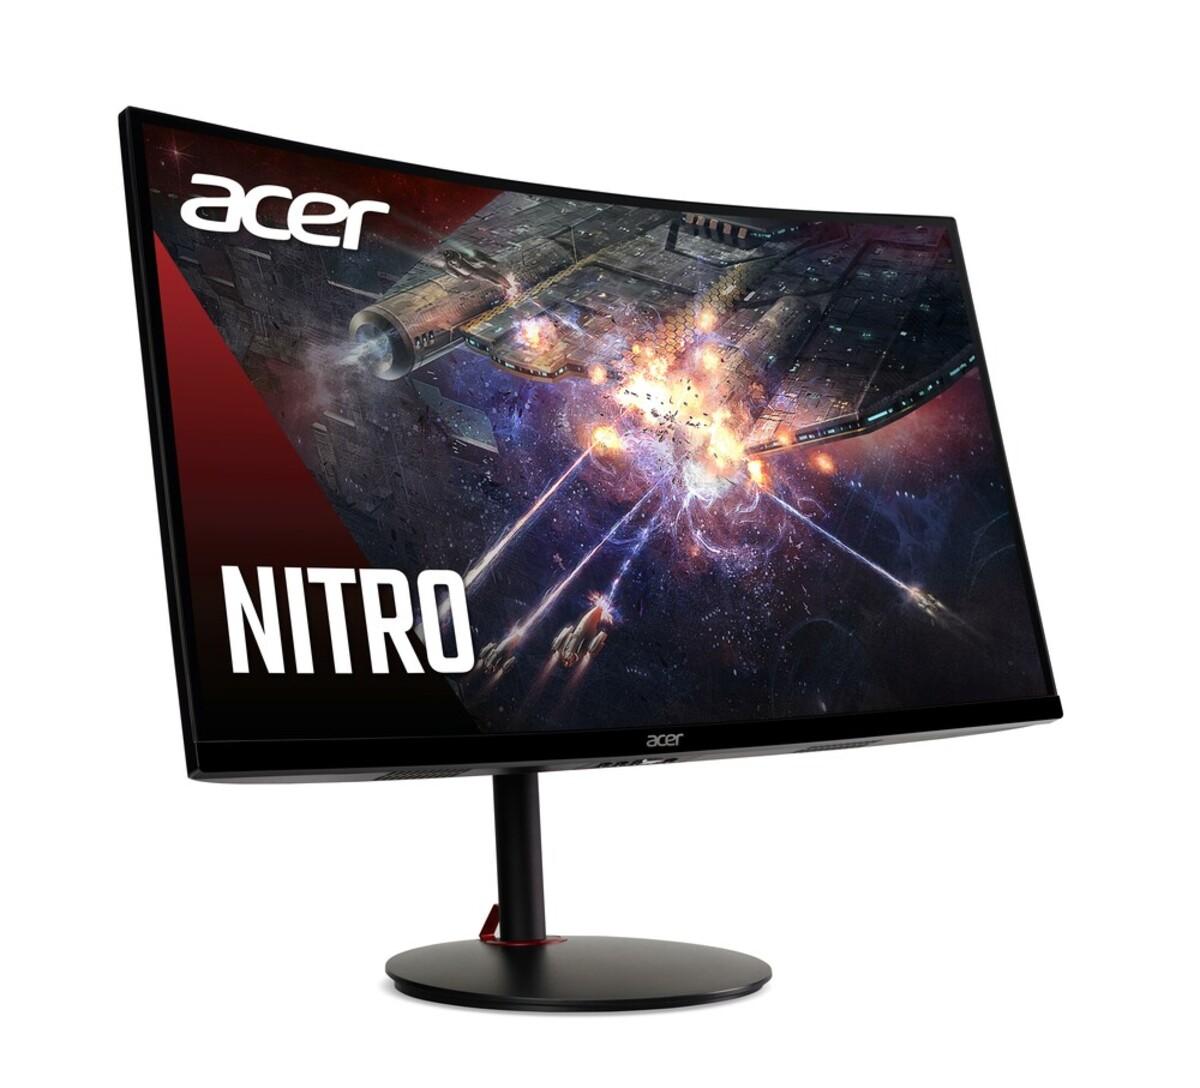 Bild 2 von ACER Nitro XZ270UPbmiiphx Gaming-Monitor (G, 27 Zoll, 2560x1440, VA, 16:9, 1 ms, 2x HDMI, DP, Freesync, 144 Hz, Pivot, Curved, Lautsprecher)